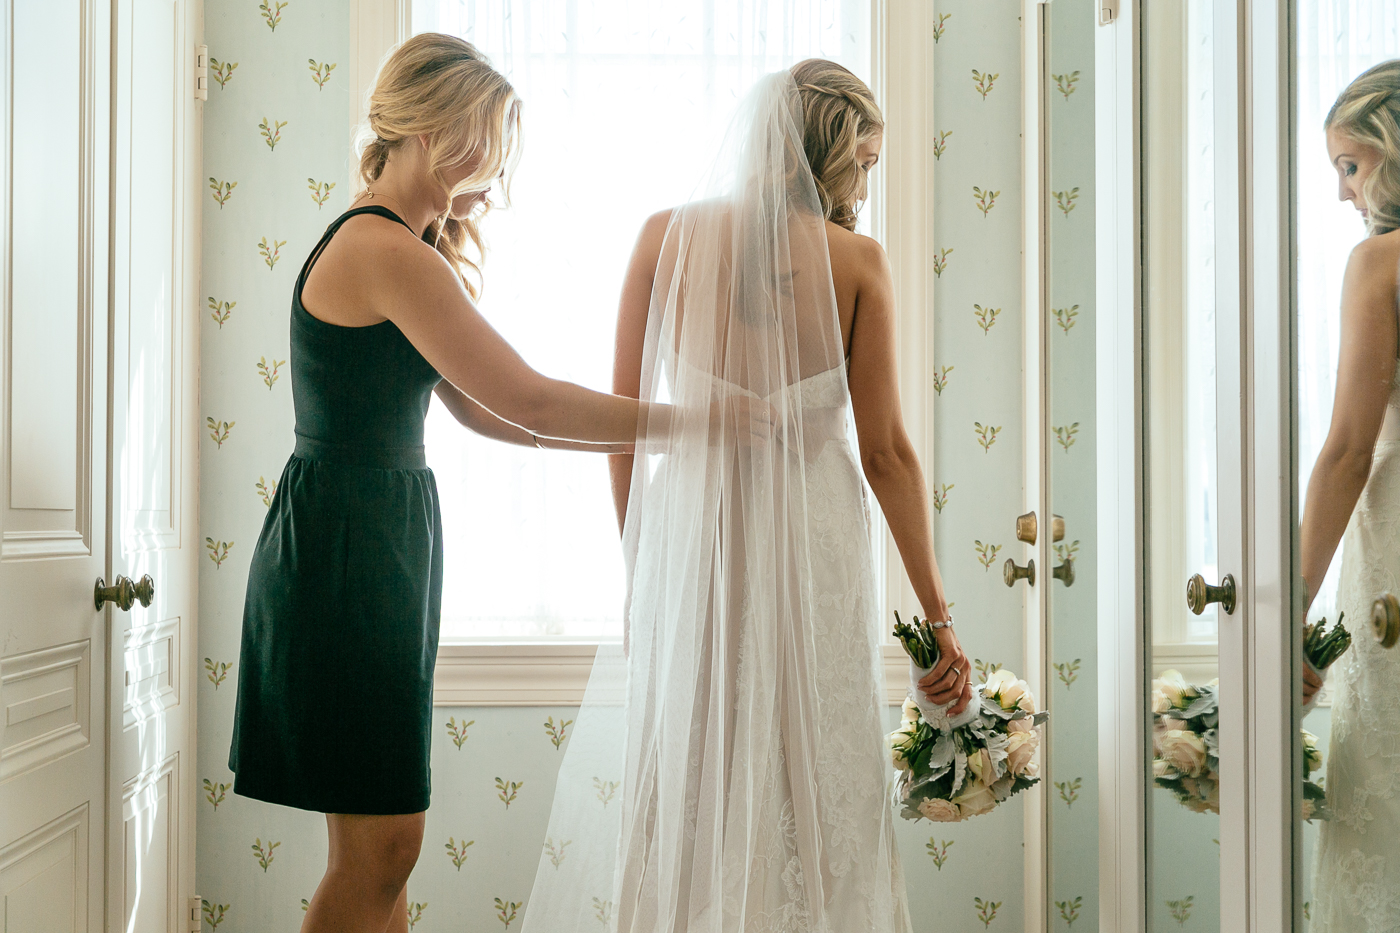 RYAN_&_KELLEY_DARLINGTON_HOUSE_WEDDING_2014_7X9A1700.JPG